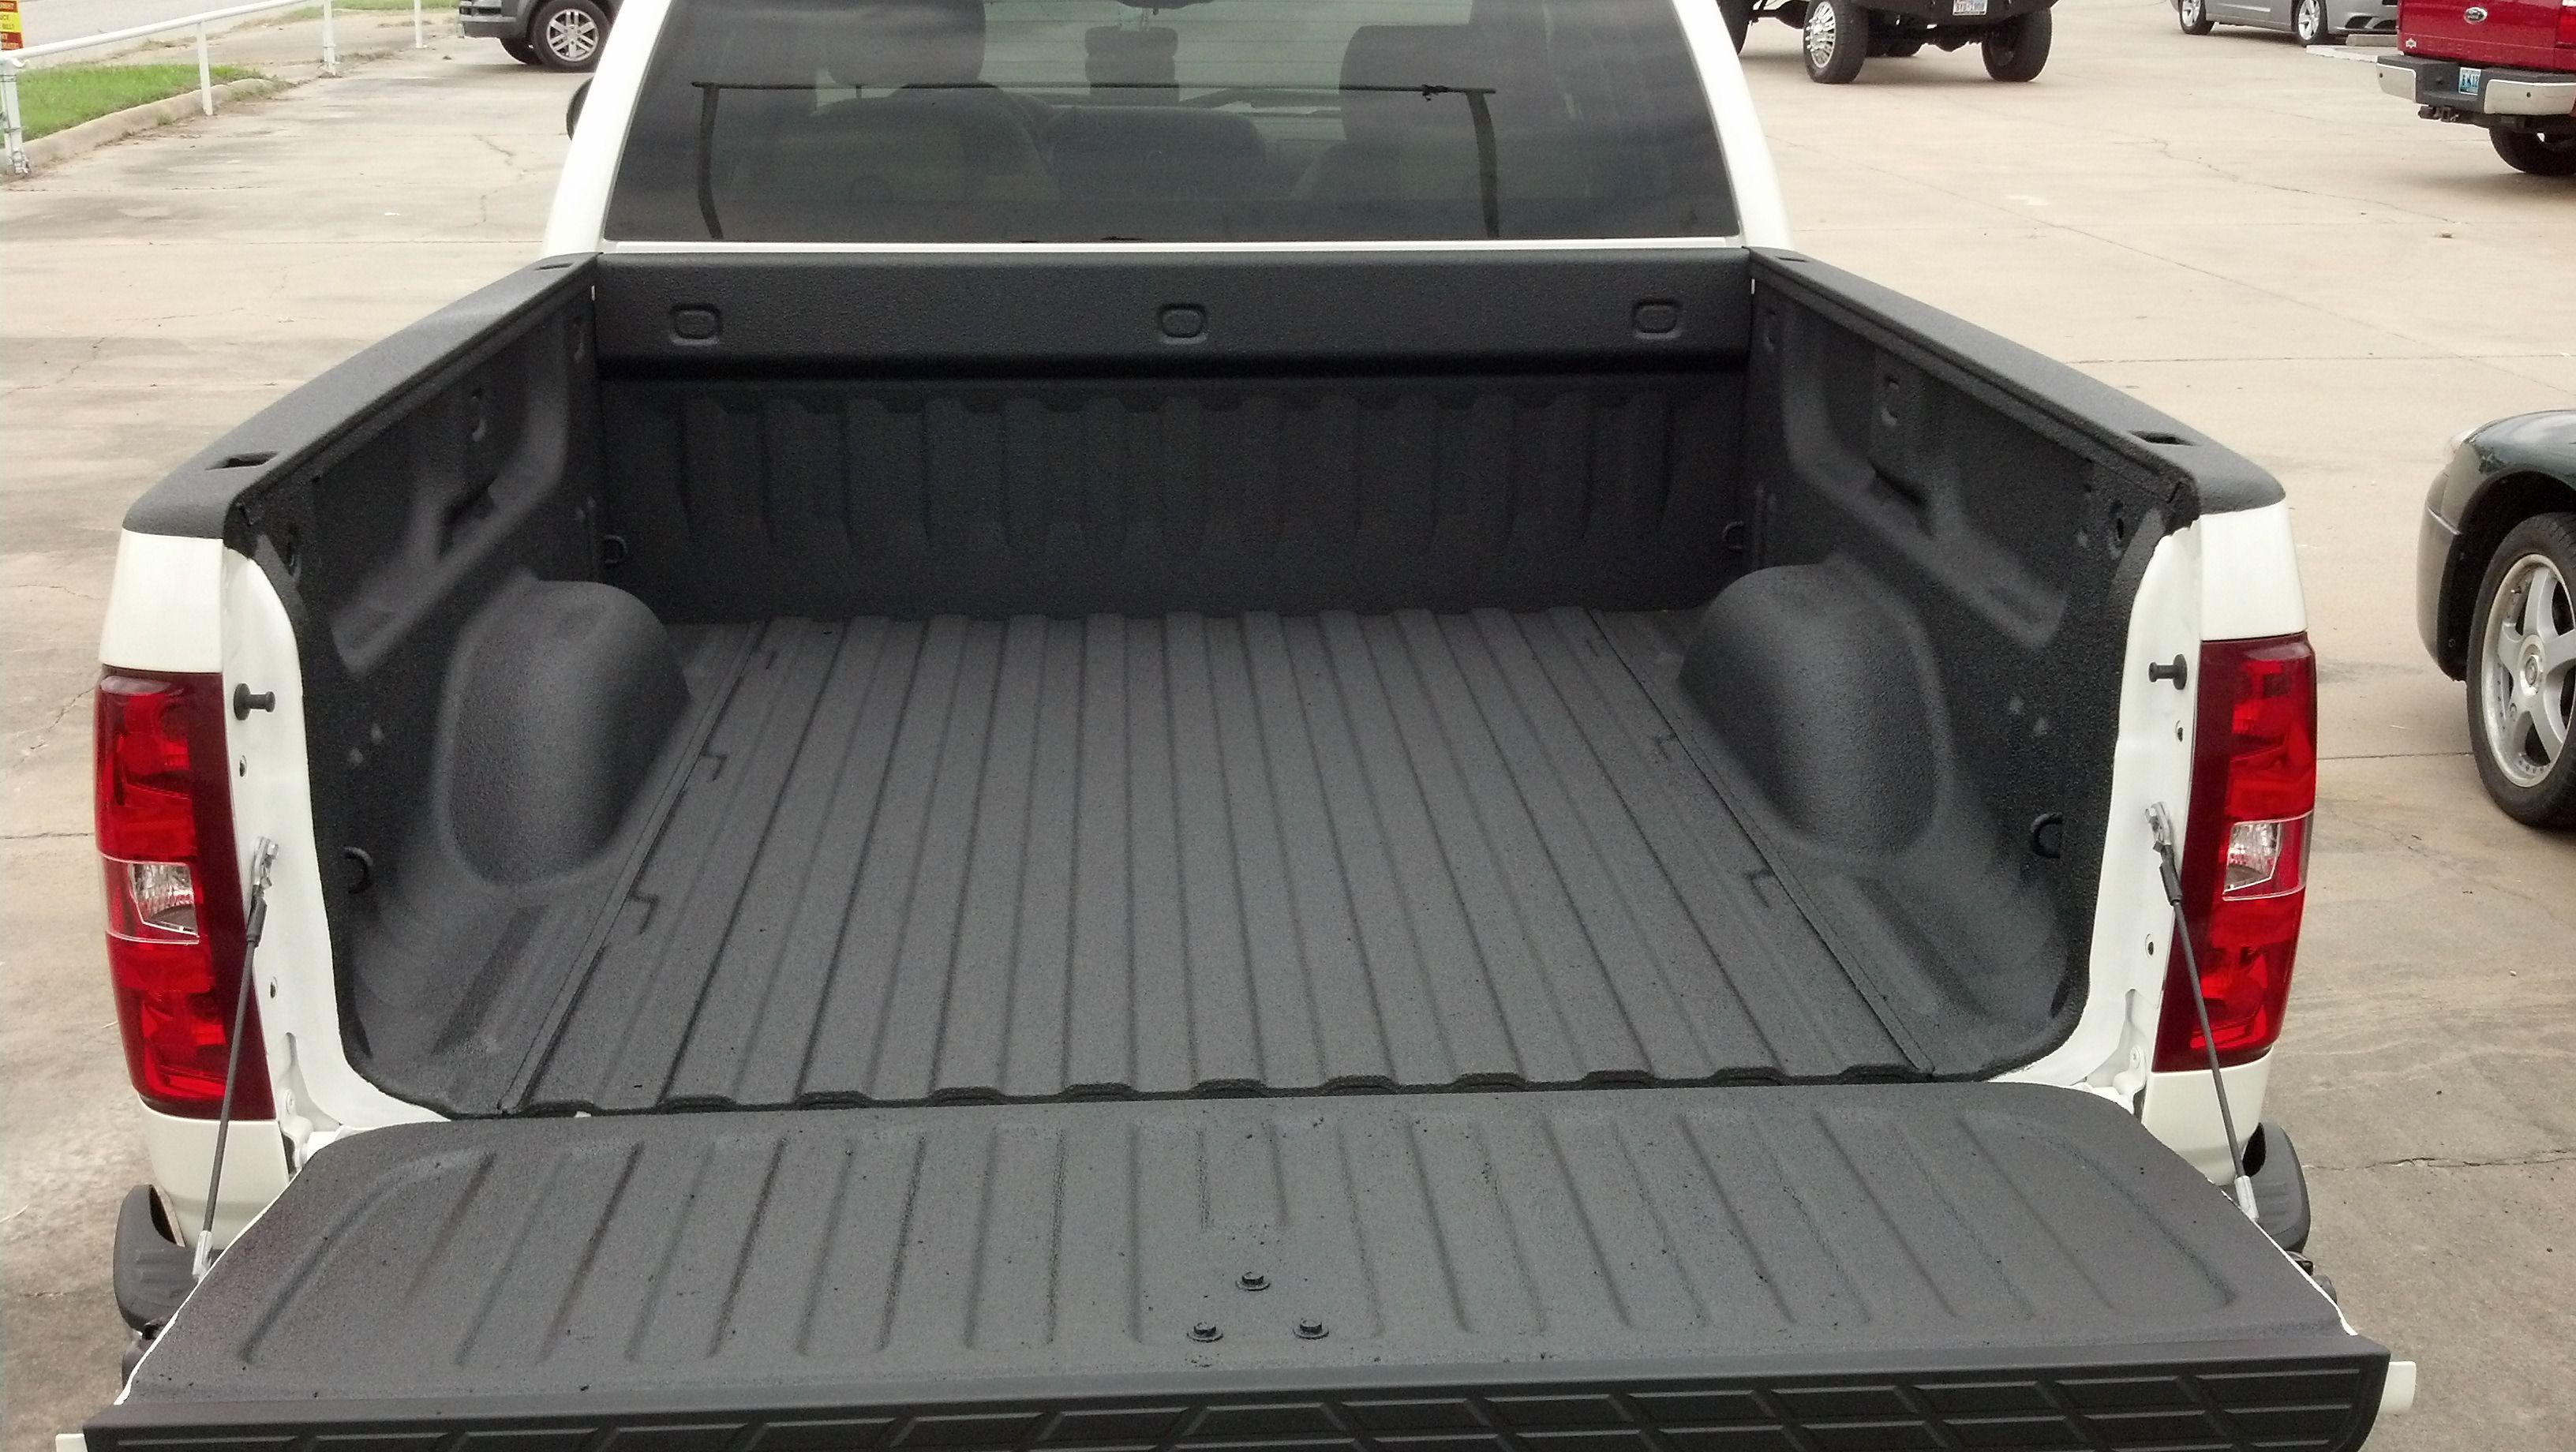 Spray Bedliner On Swb Chevy Truck